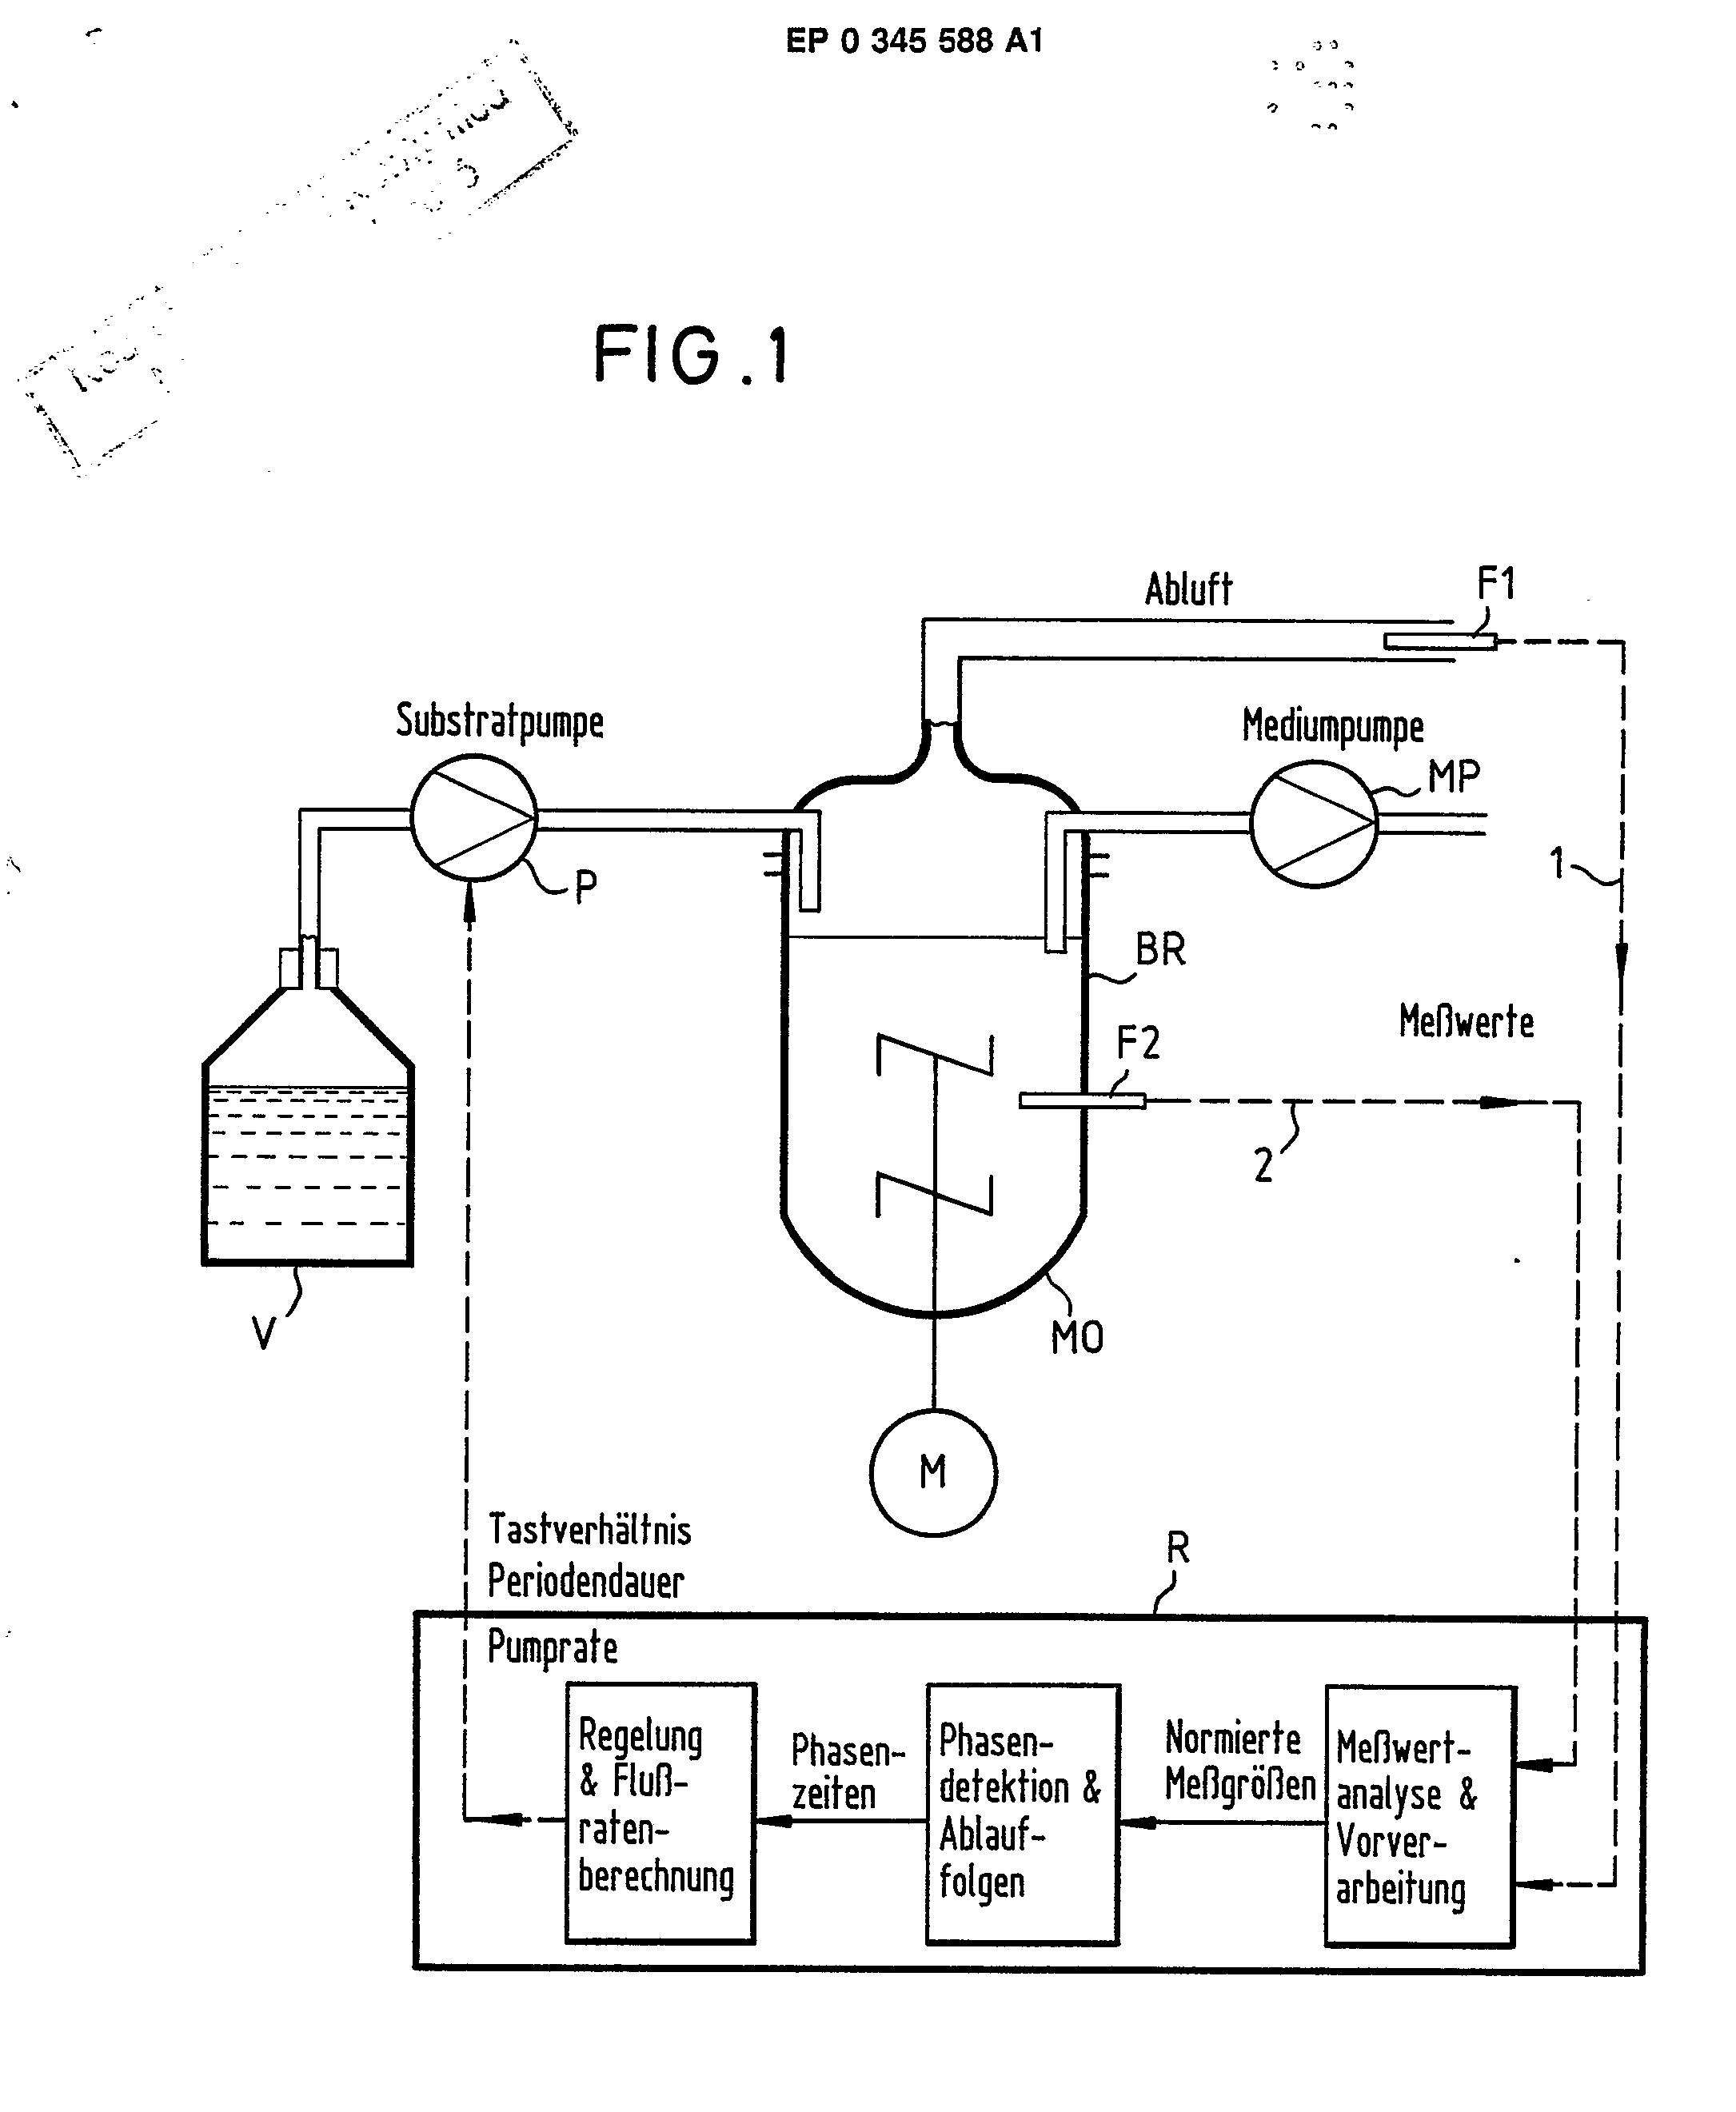 1 regelung berechnen e r 1 prozent regelung pierre tunger. Black Bedroom Furniture Sets. Home Design Ideas